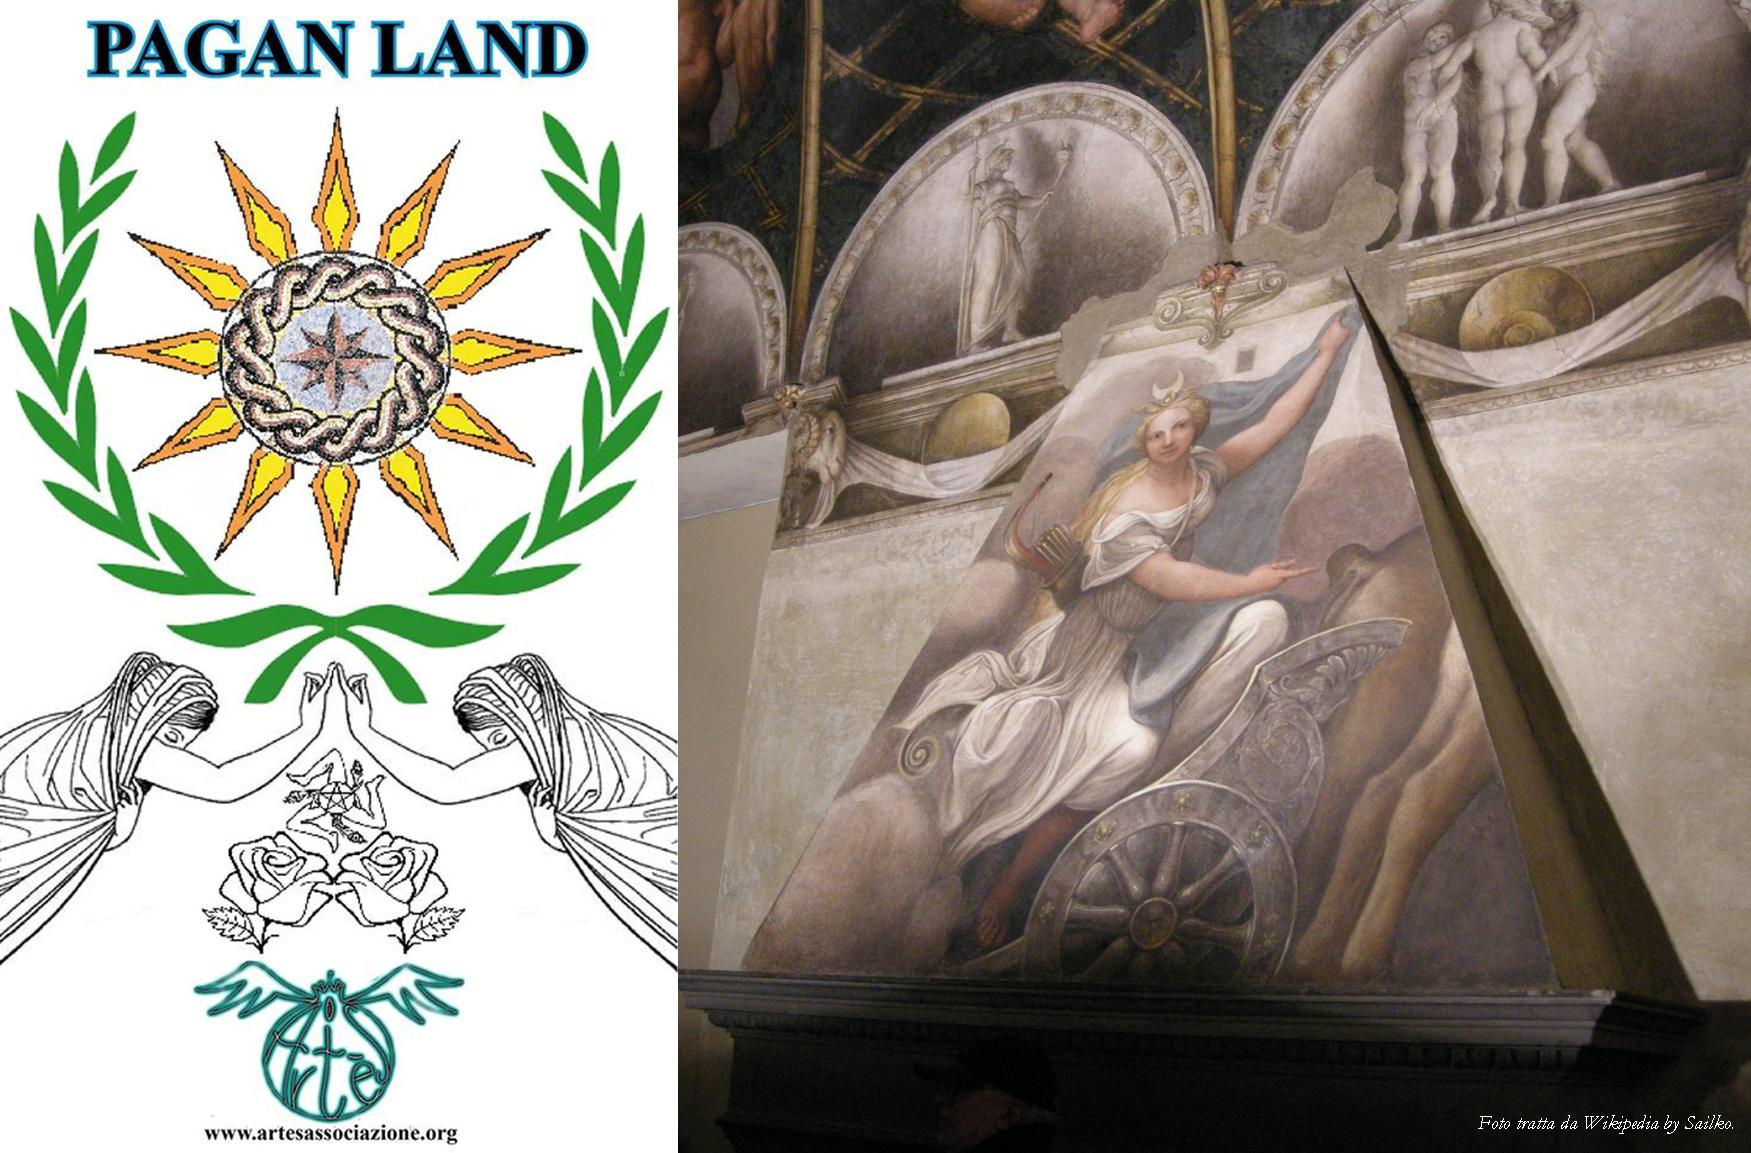 Pagan Land 2014